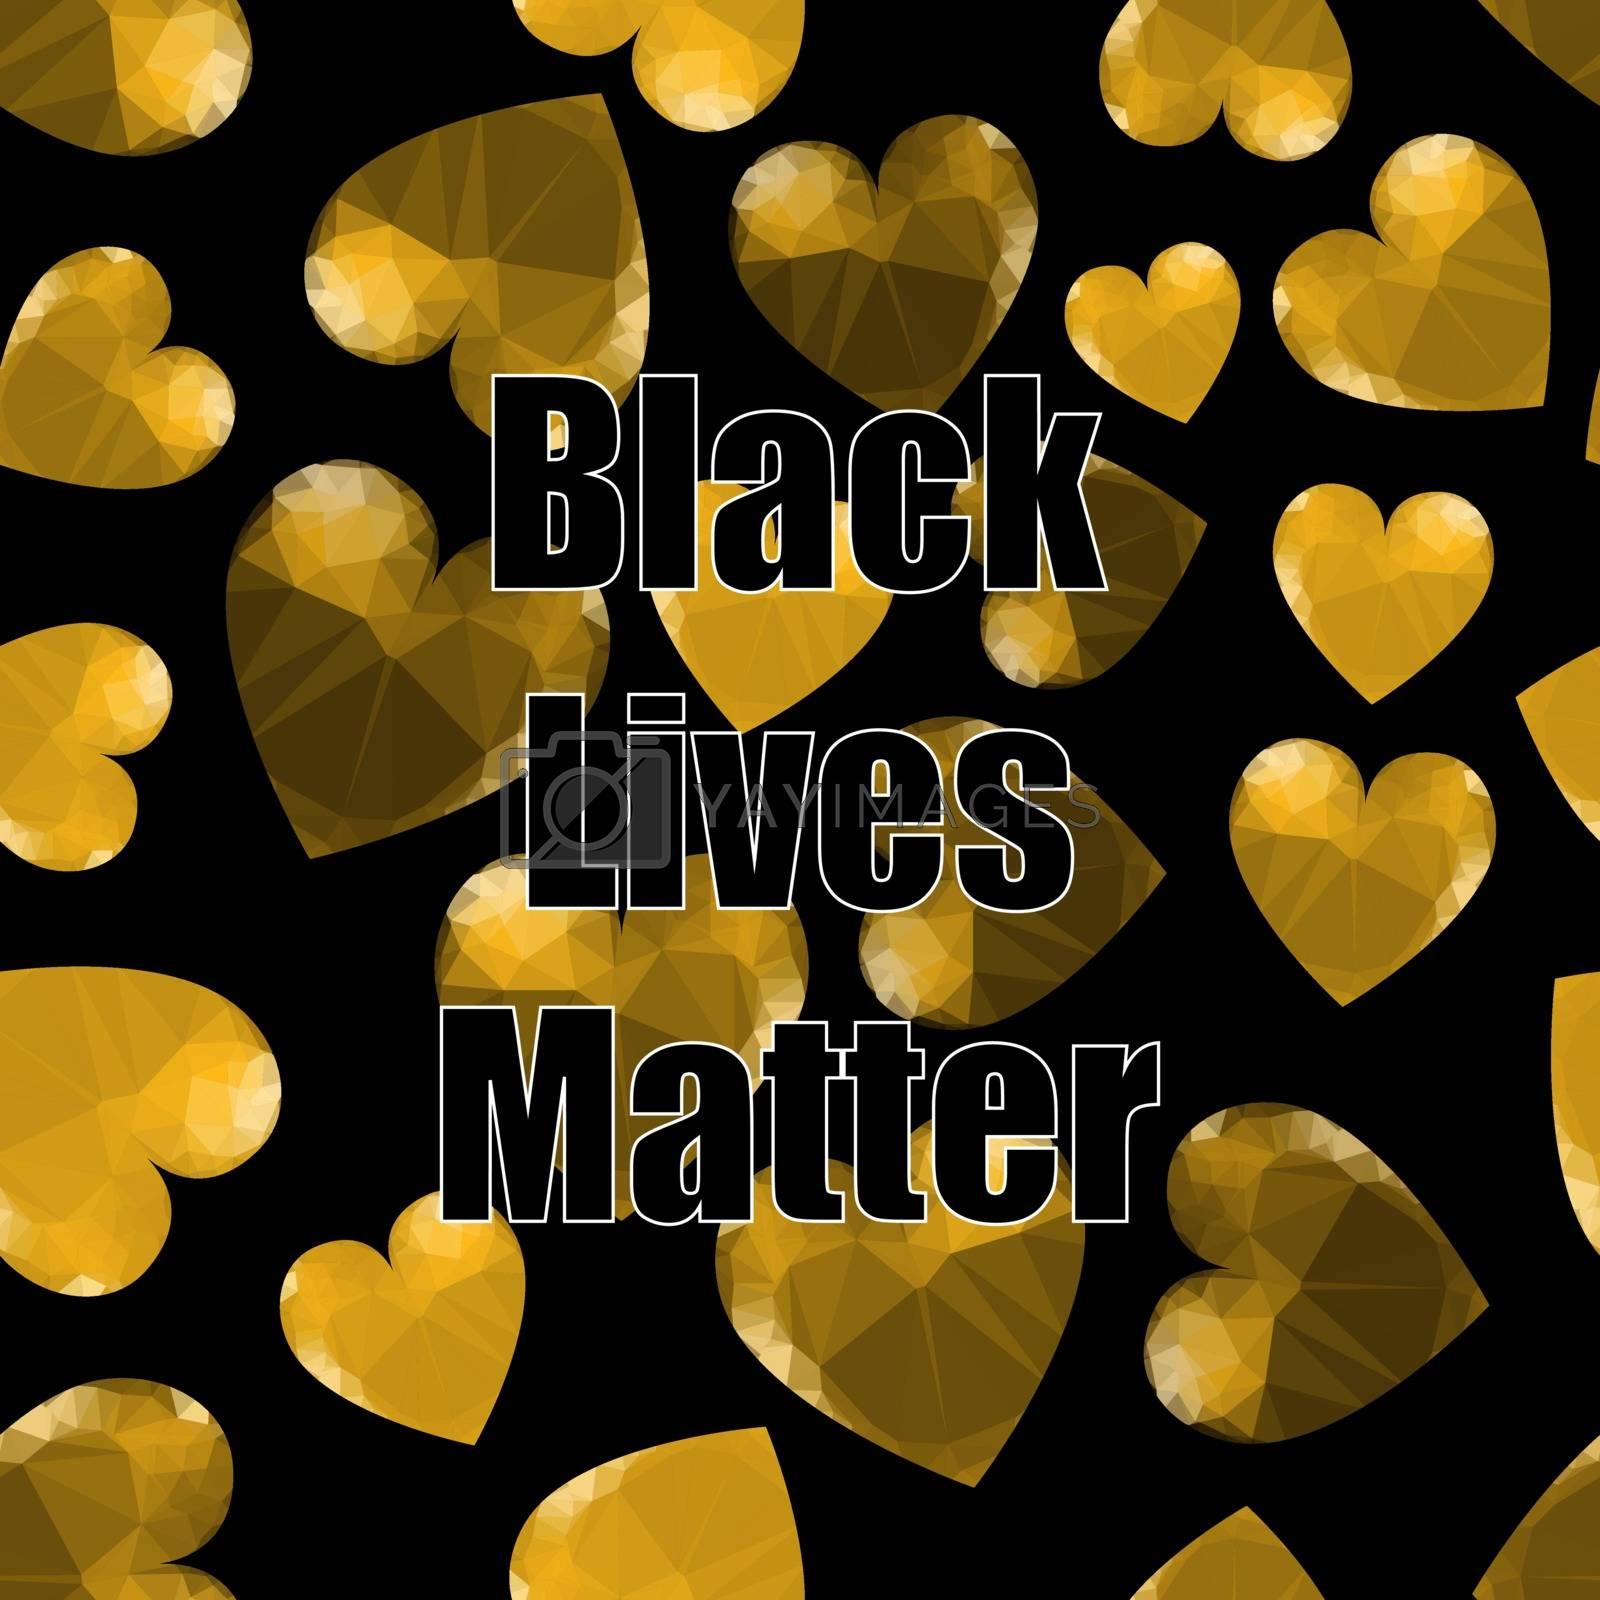 Black Lives Matter Banner with Hearts for Protest on Black Background.